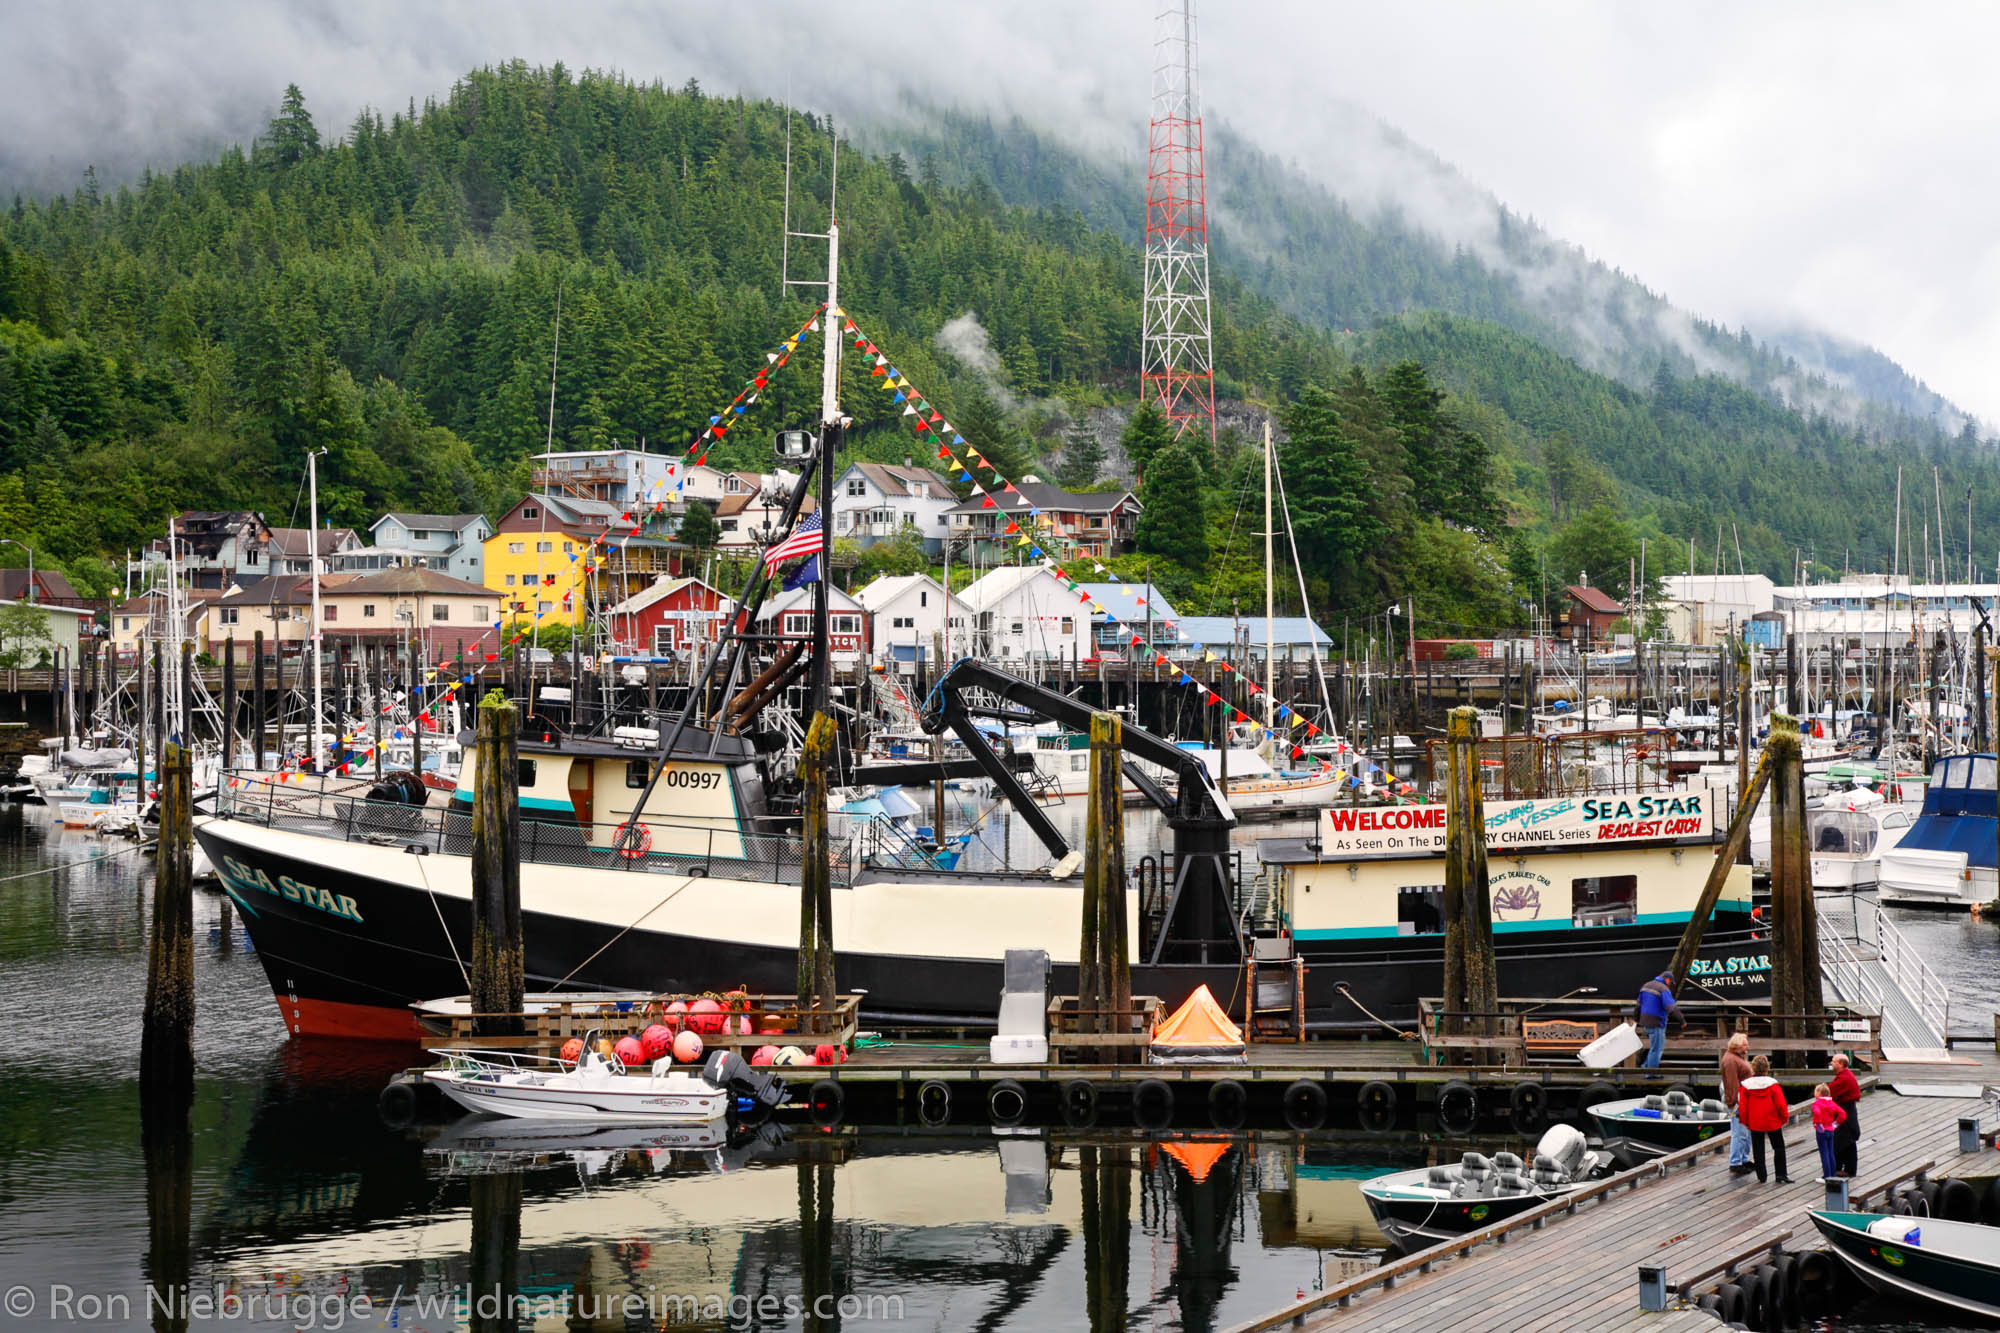 The Sea Star from the show Deadliest Catch, Ketchikan, Alaska.